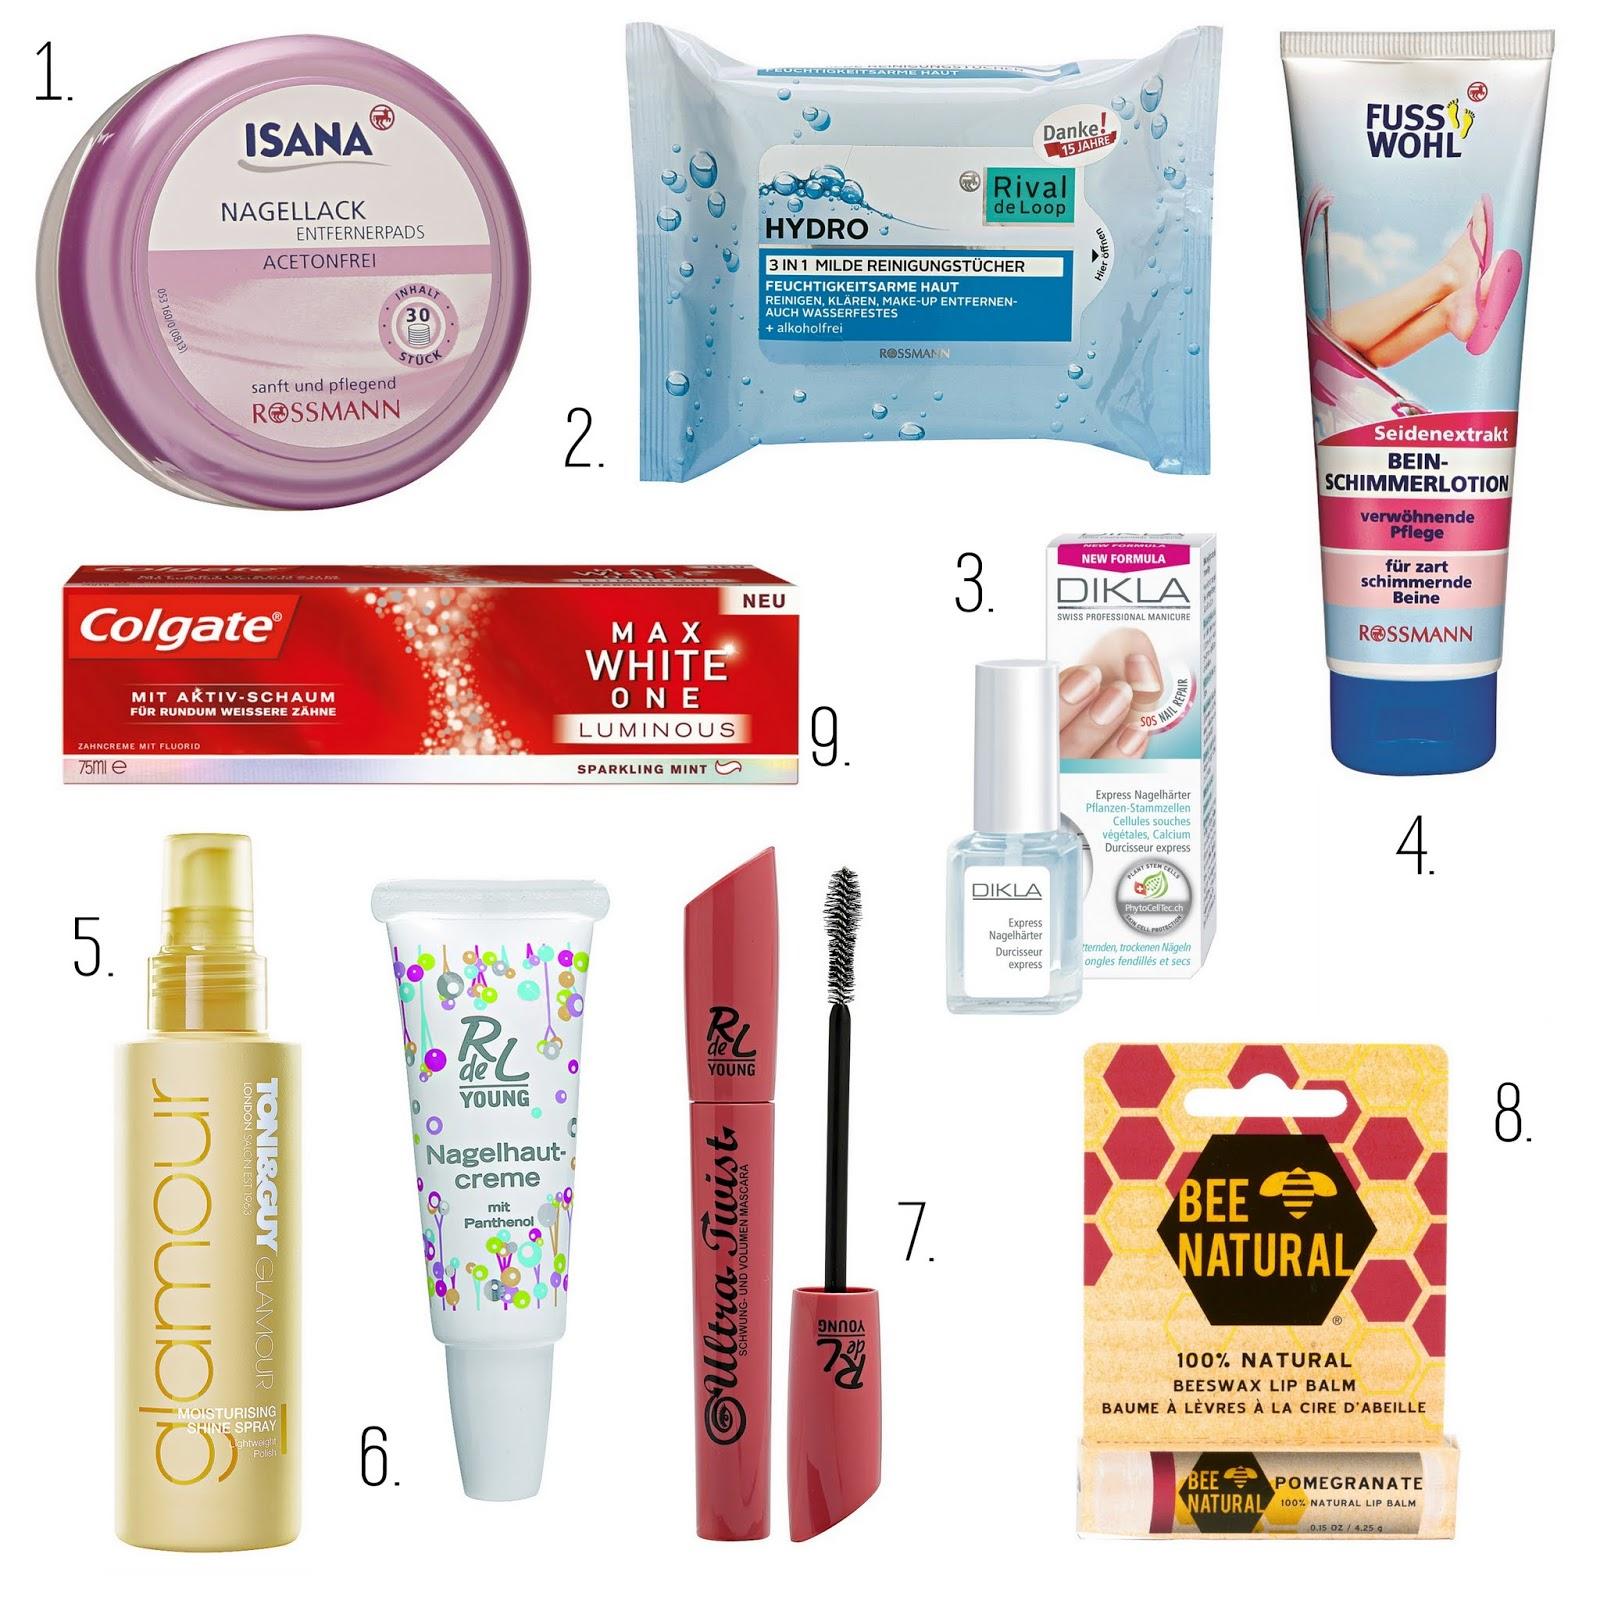 Rossmann sfm Beautybox April Inhalt Produkte Details